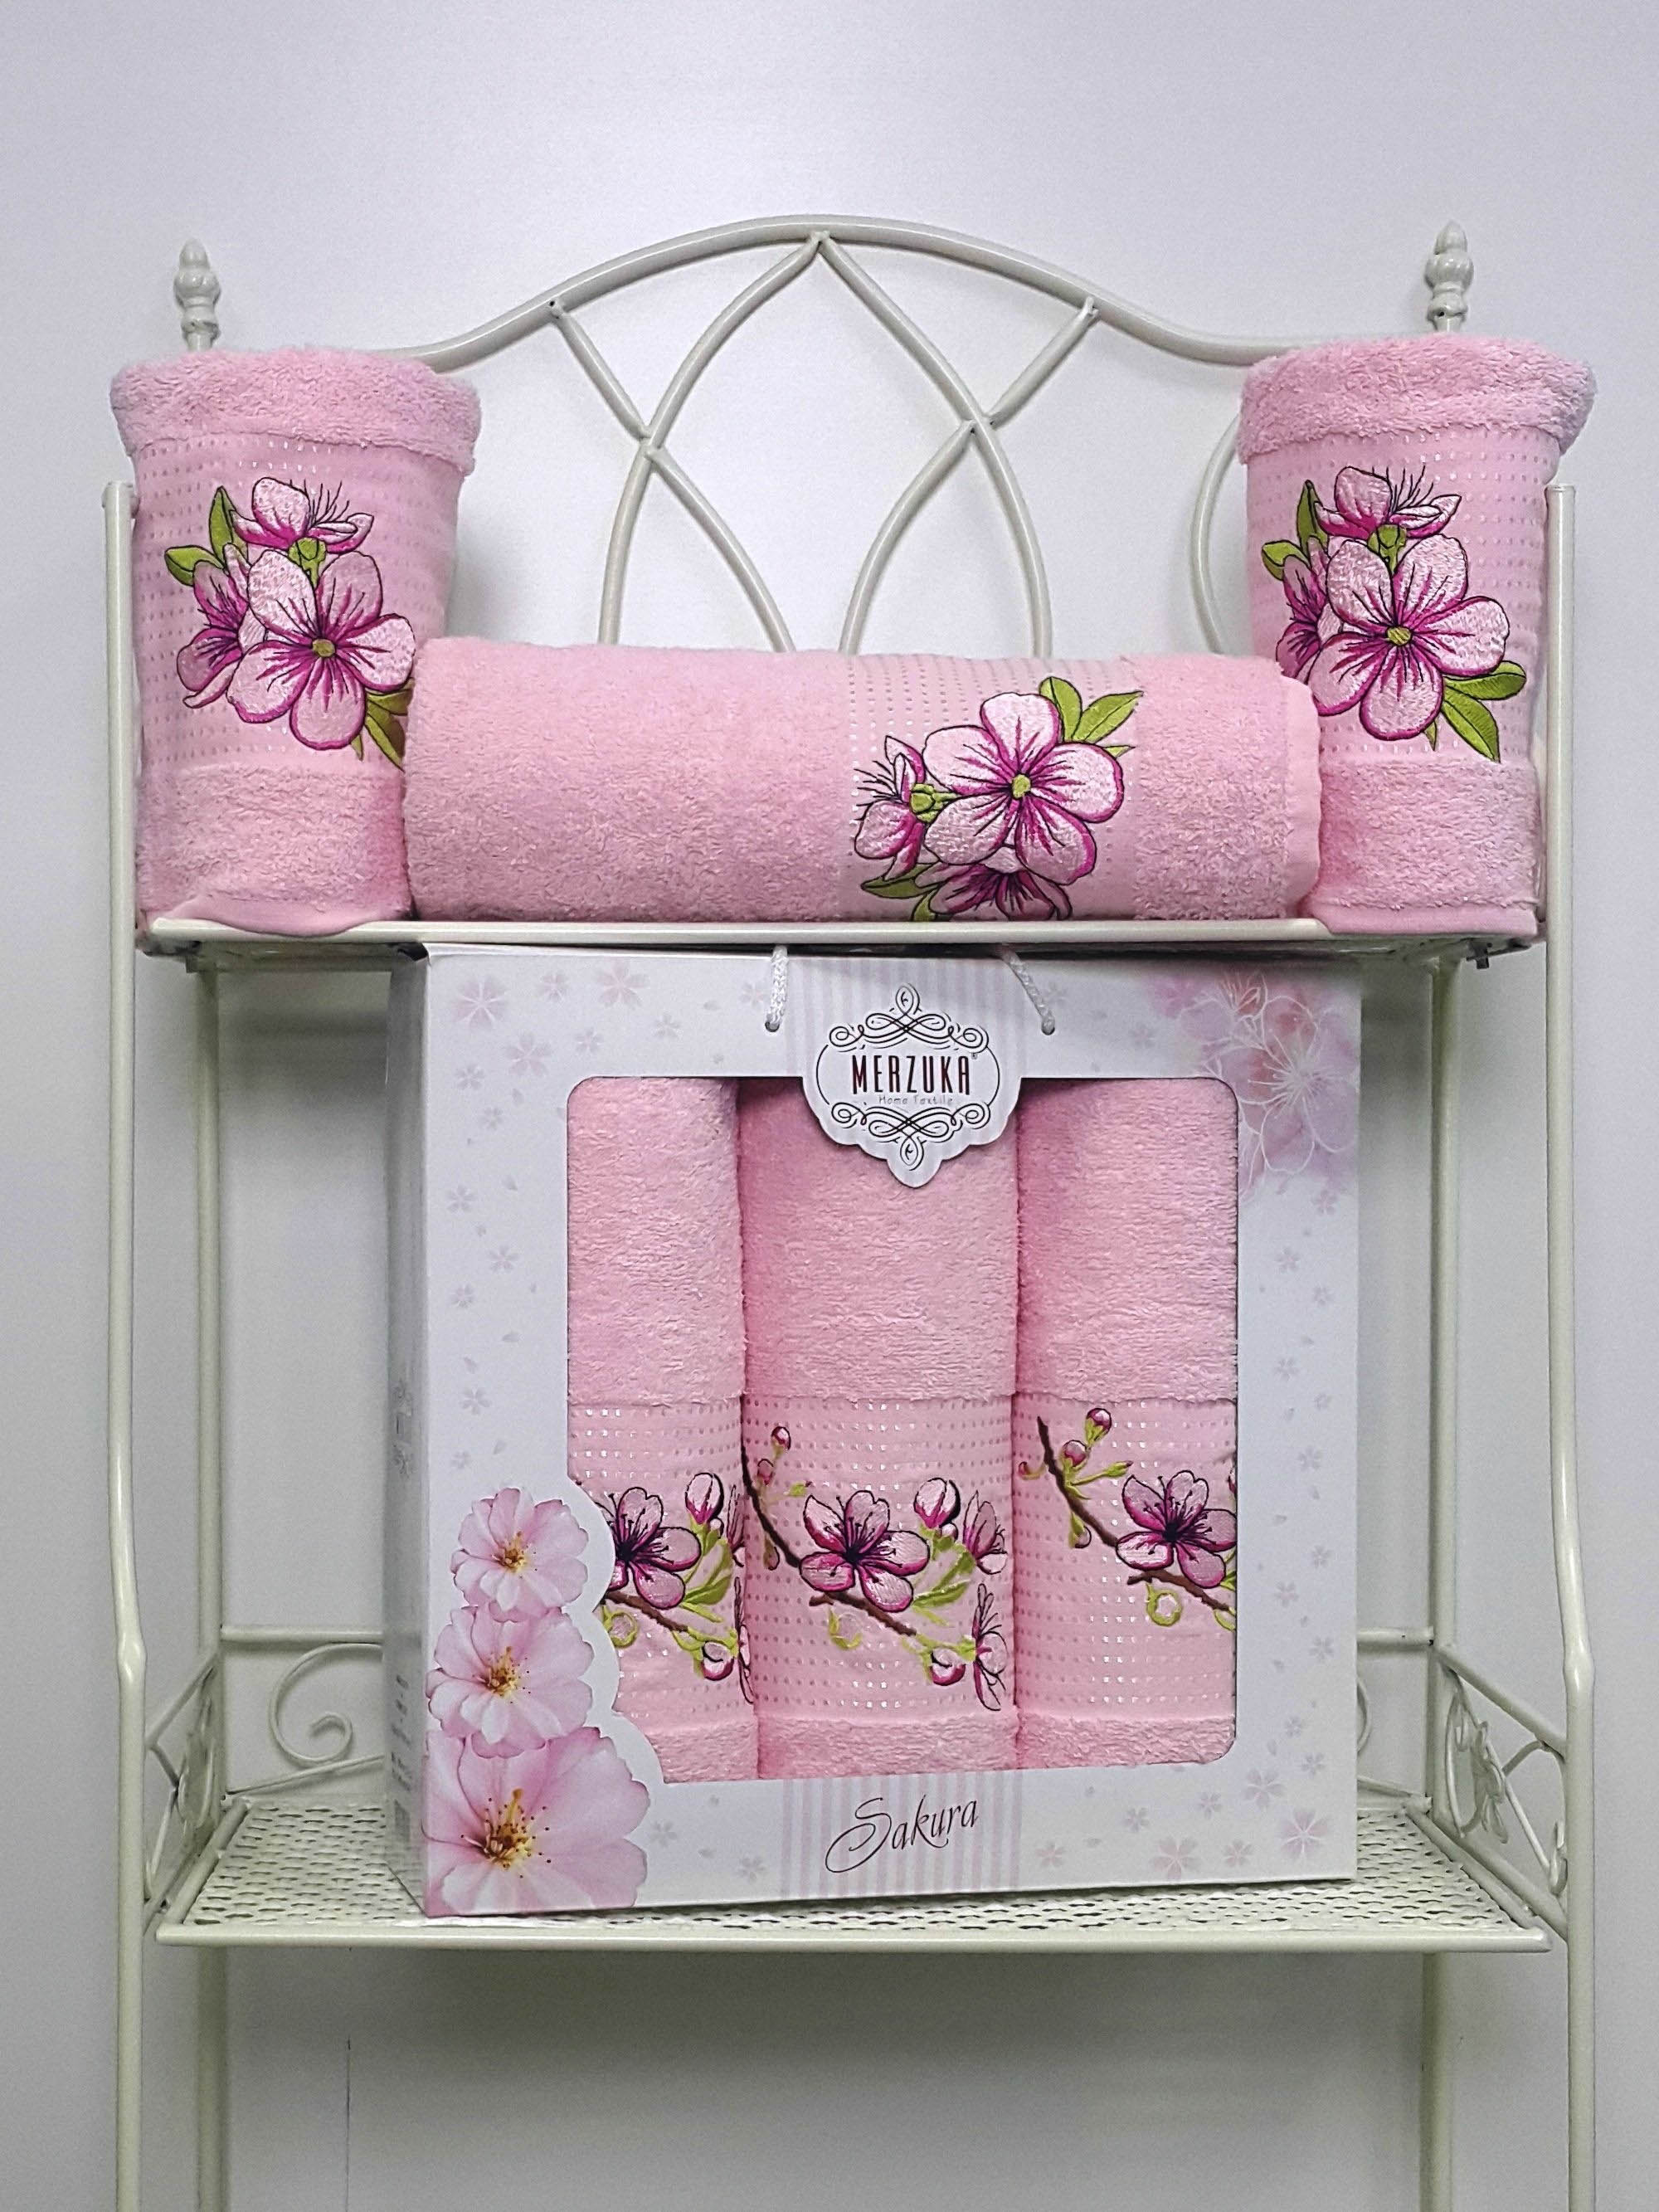 Полотенца Oran Merzuka Полотенце Sakura Цвет: Светло-Розовый (Набор) набор из 3 полотенец merzuka sakura 50х90 2 70х140 8432 терракотовый